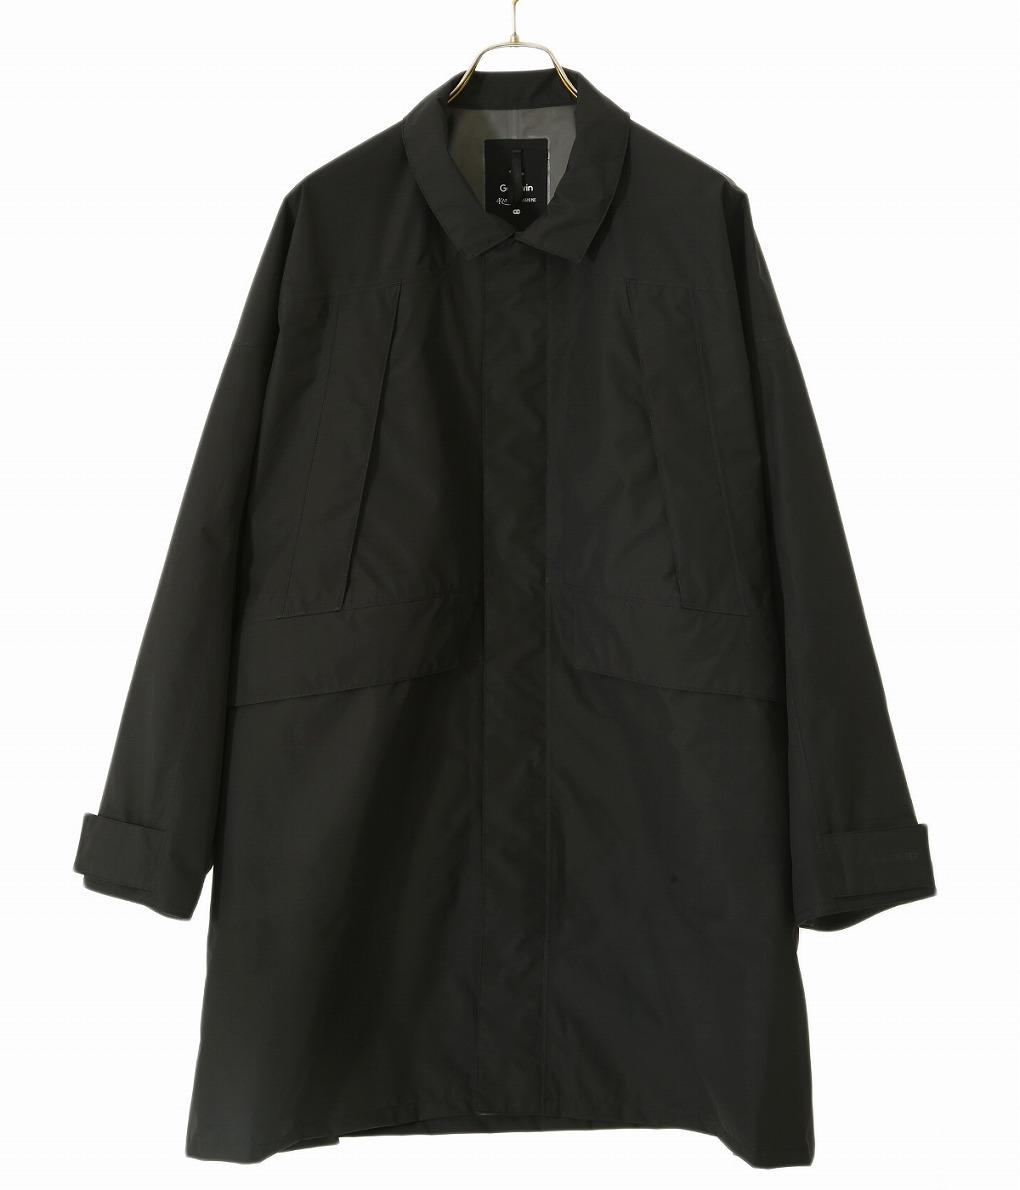 KAPTAIN SUNSHINE / キャプテンサンシャイン : Gore-Tex Stand Collar Field Coat : ゴアテックス スタンド カラー フィールド コート : KS20SGW01 【NOA】